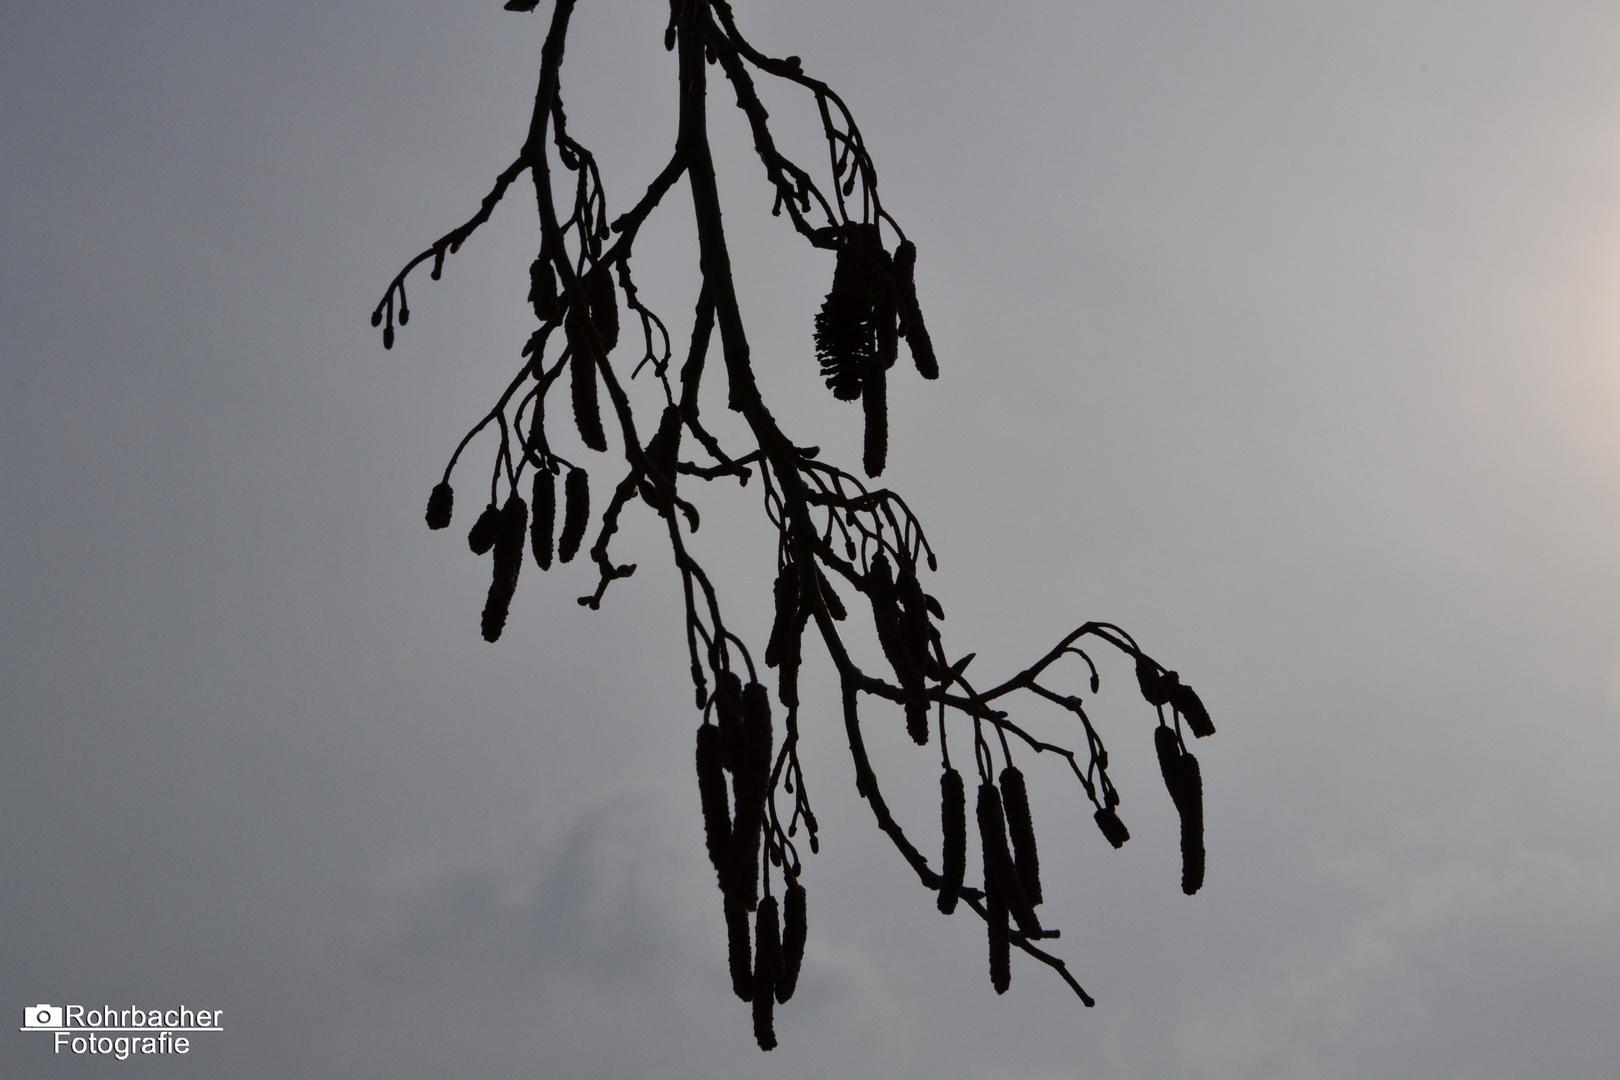 Dunkles am Winterhimmel